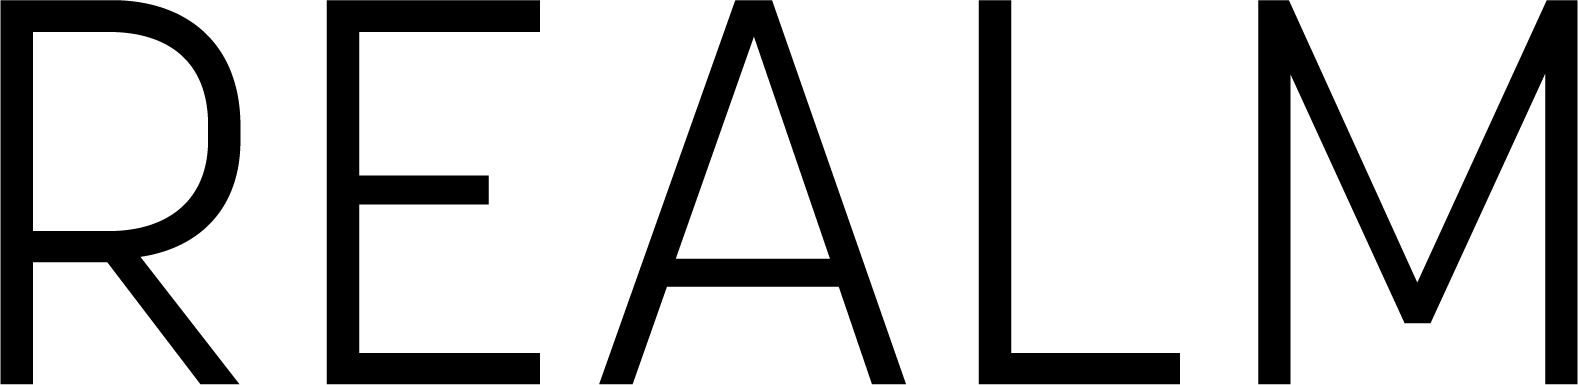 REALM_black_RGB.png